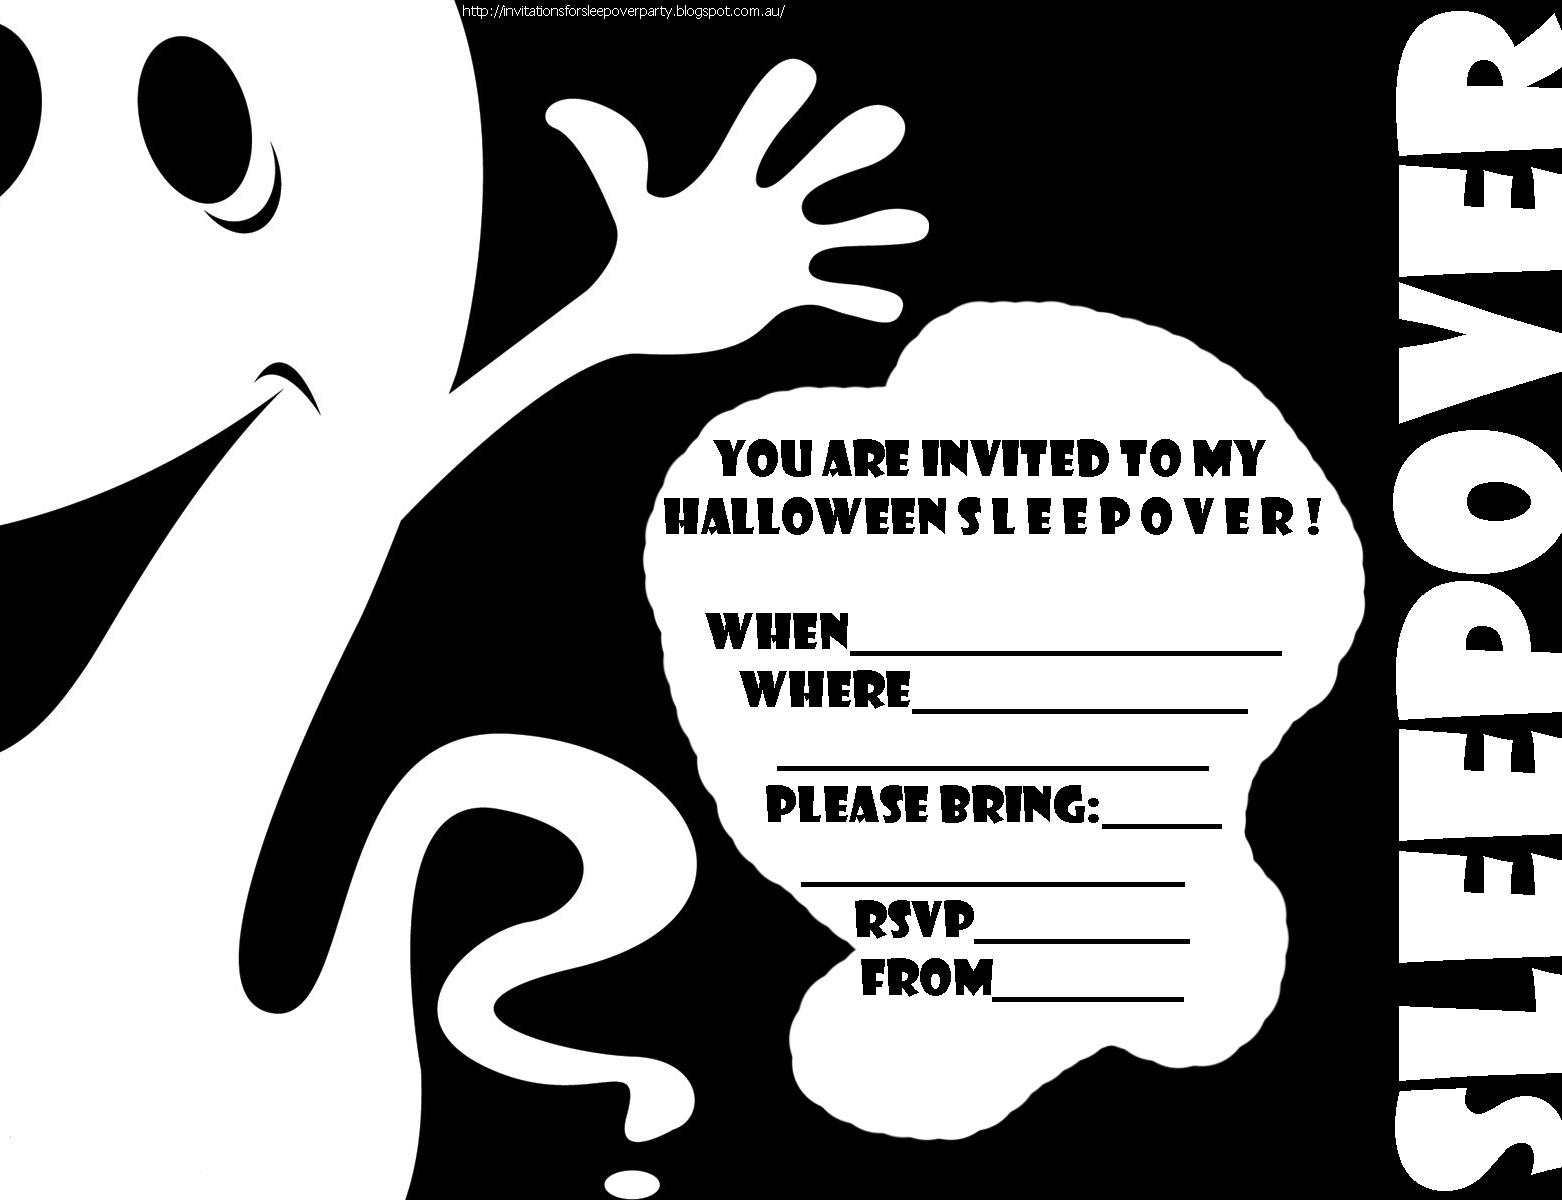 Free Printable Halloween Sleepover Invitations | Halloween Arts - Halloween Invitations Free Printable Black And White